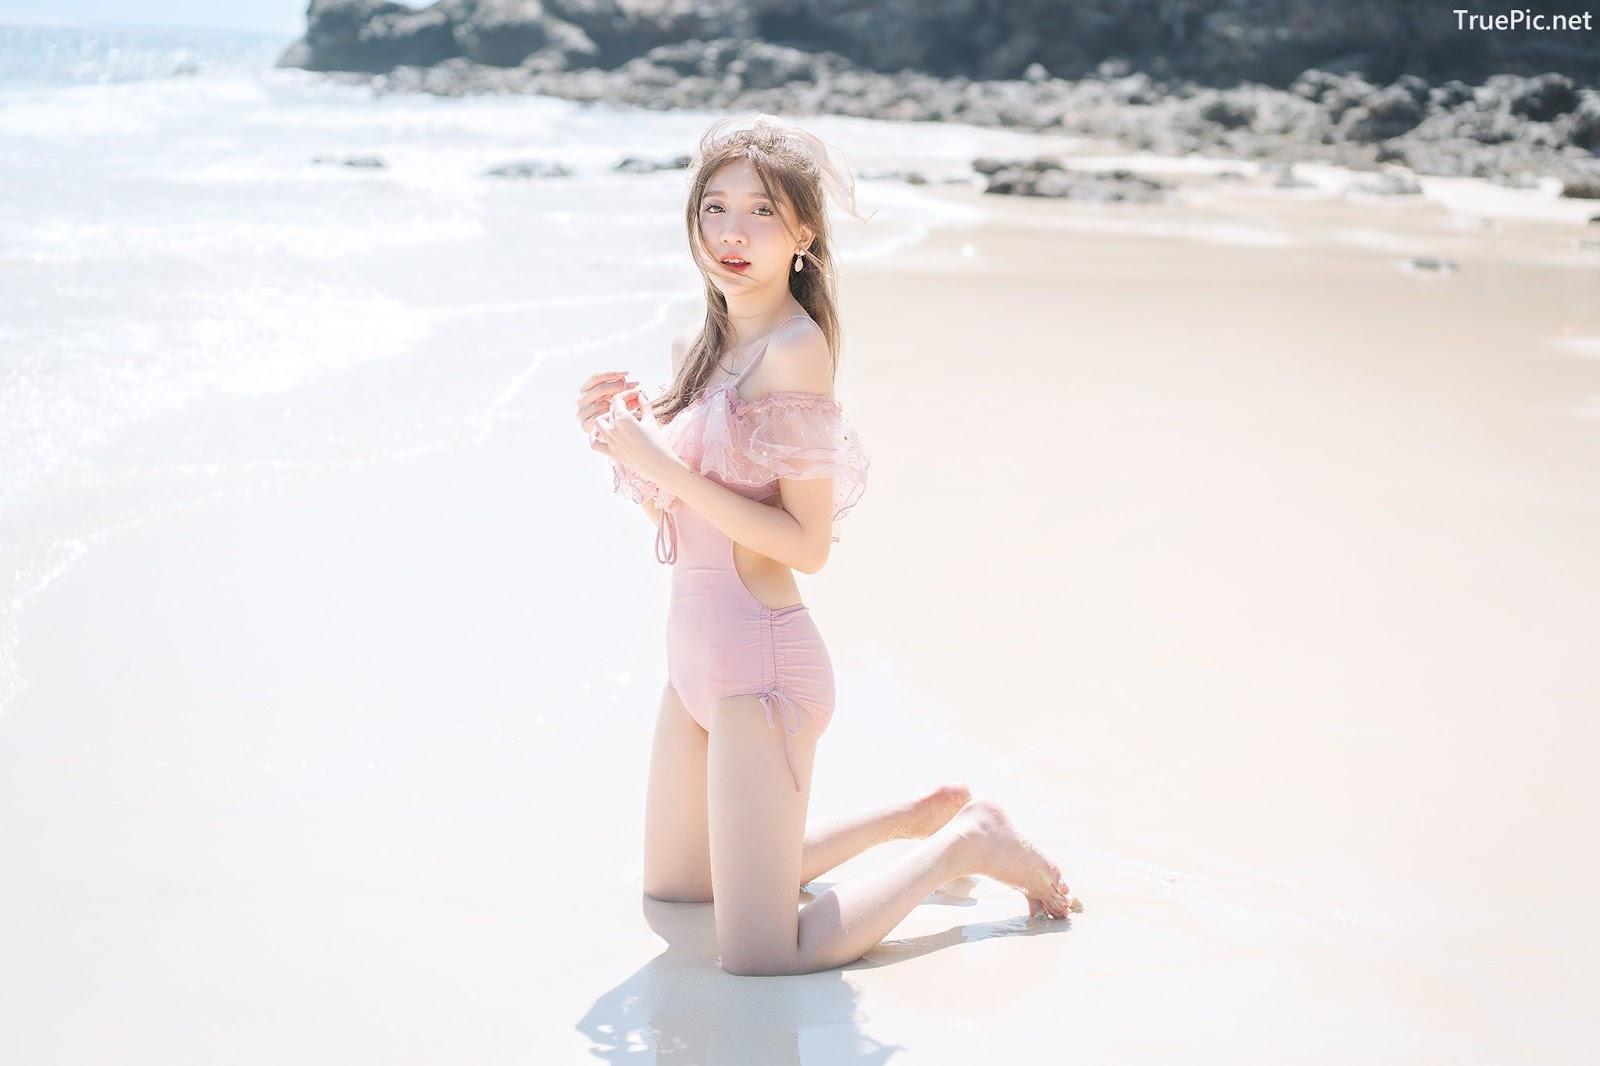 Image Thailand Model - Sasi Ngiunwan - Pink Monokini - TruePic.net - Picture-3